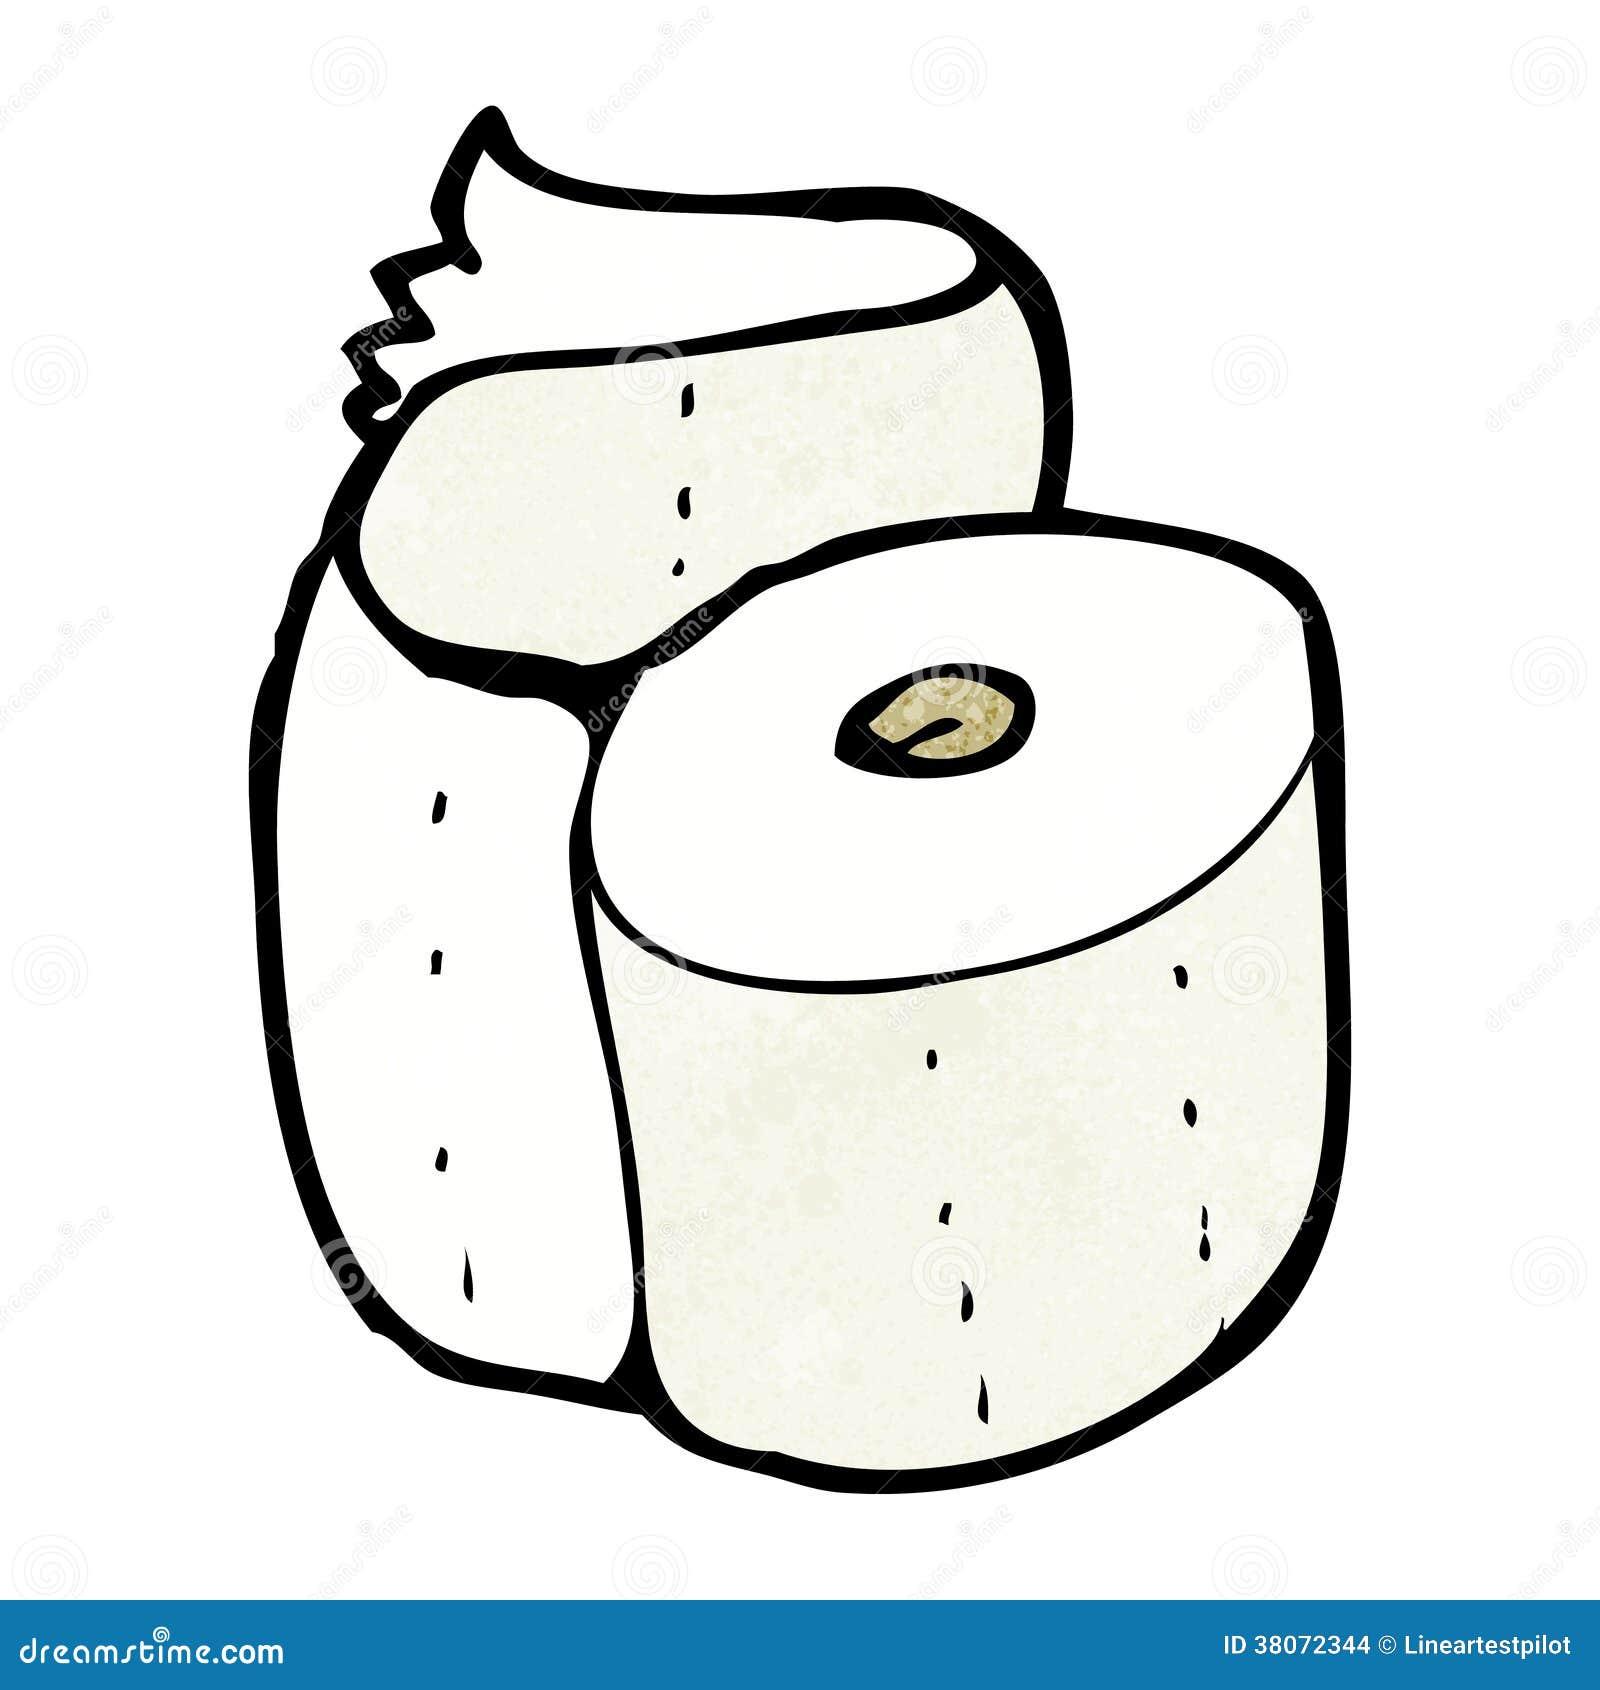 Cartoon toilet roll stock illustration. Illustration of ...